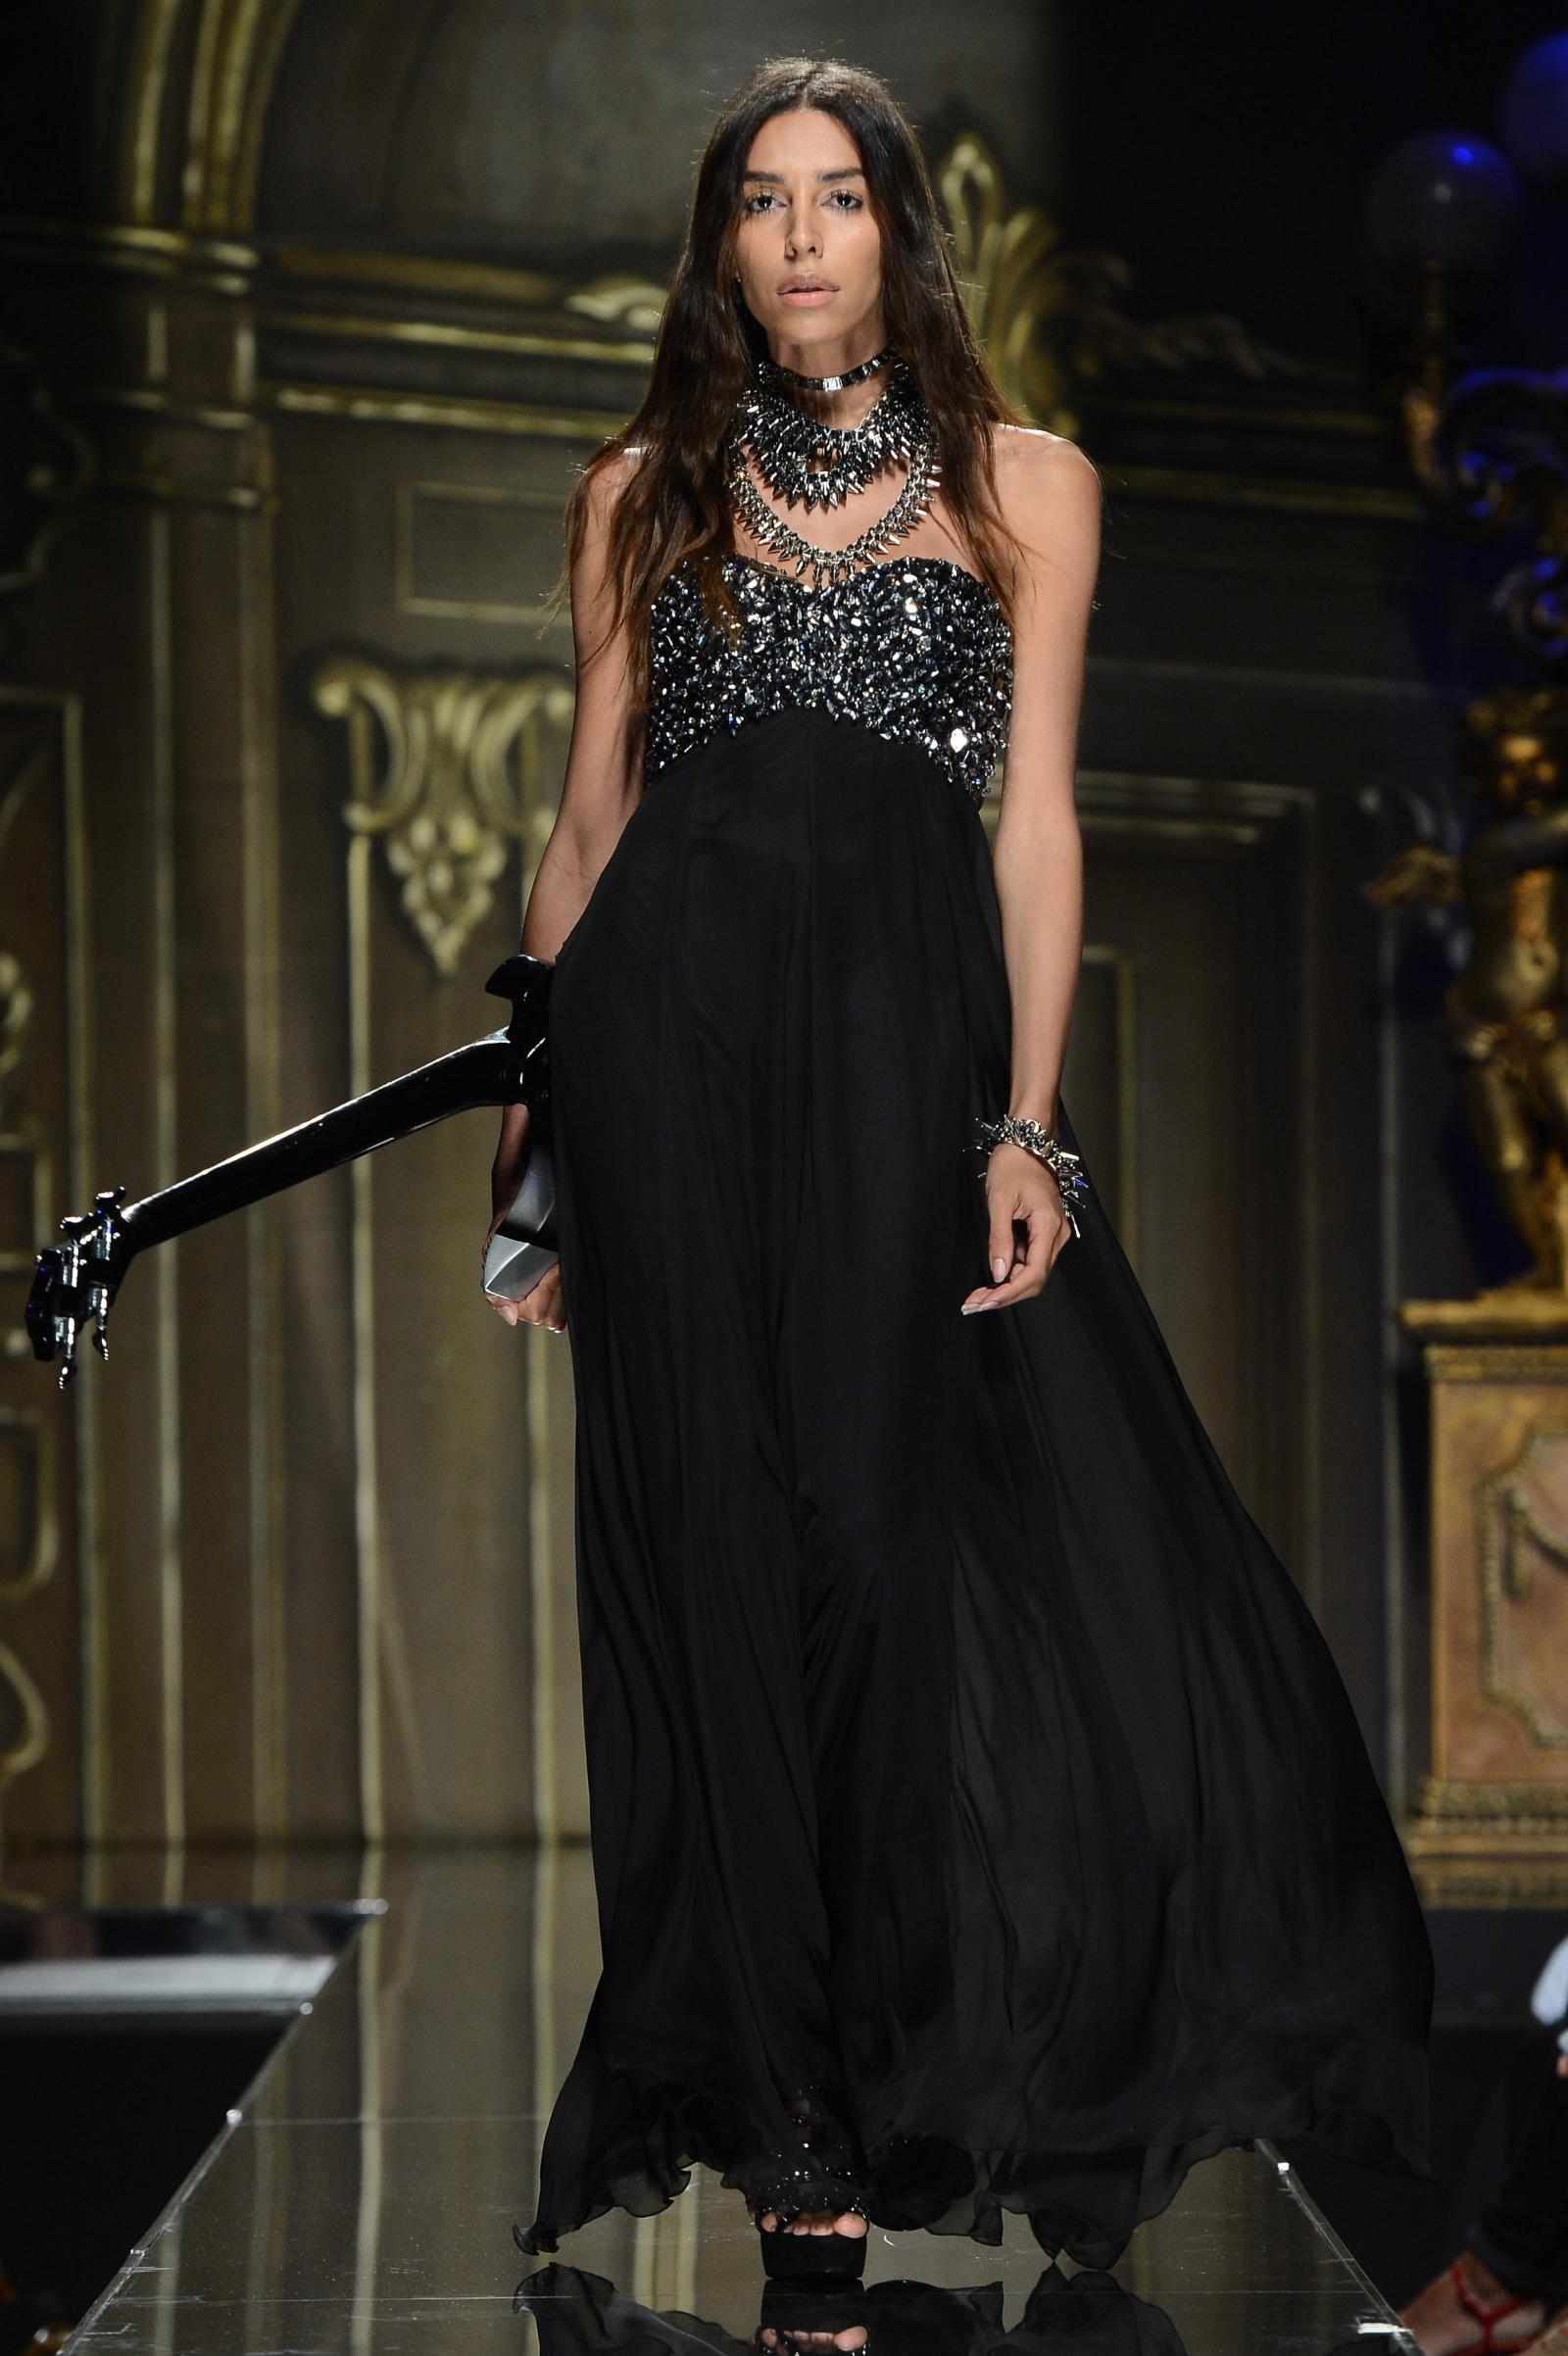 Model Lea T at the  Milan Womenswear Fashion Week